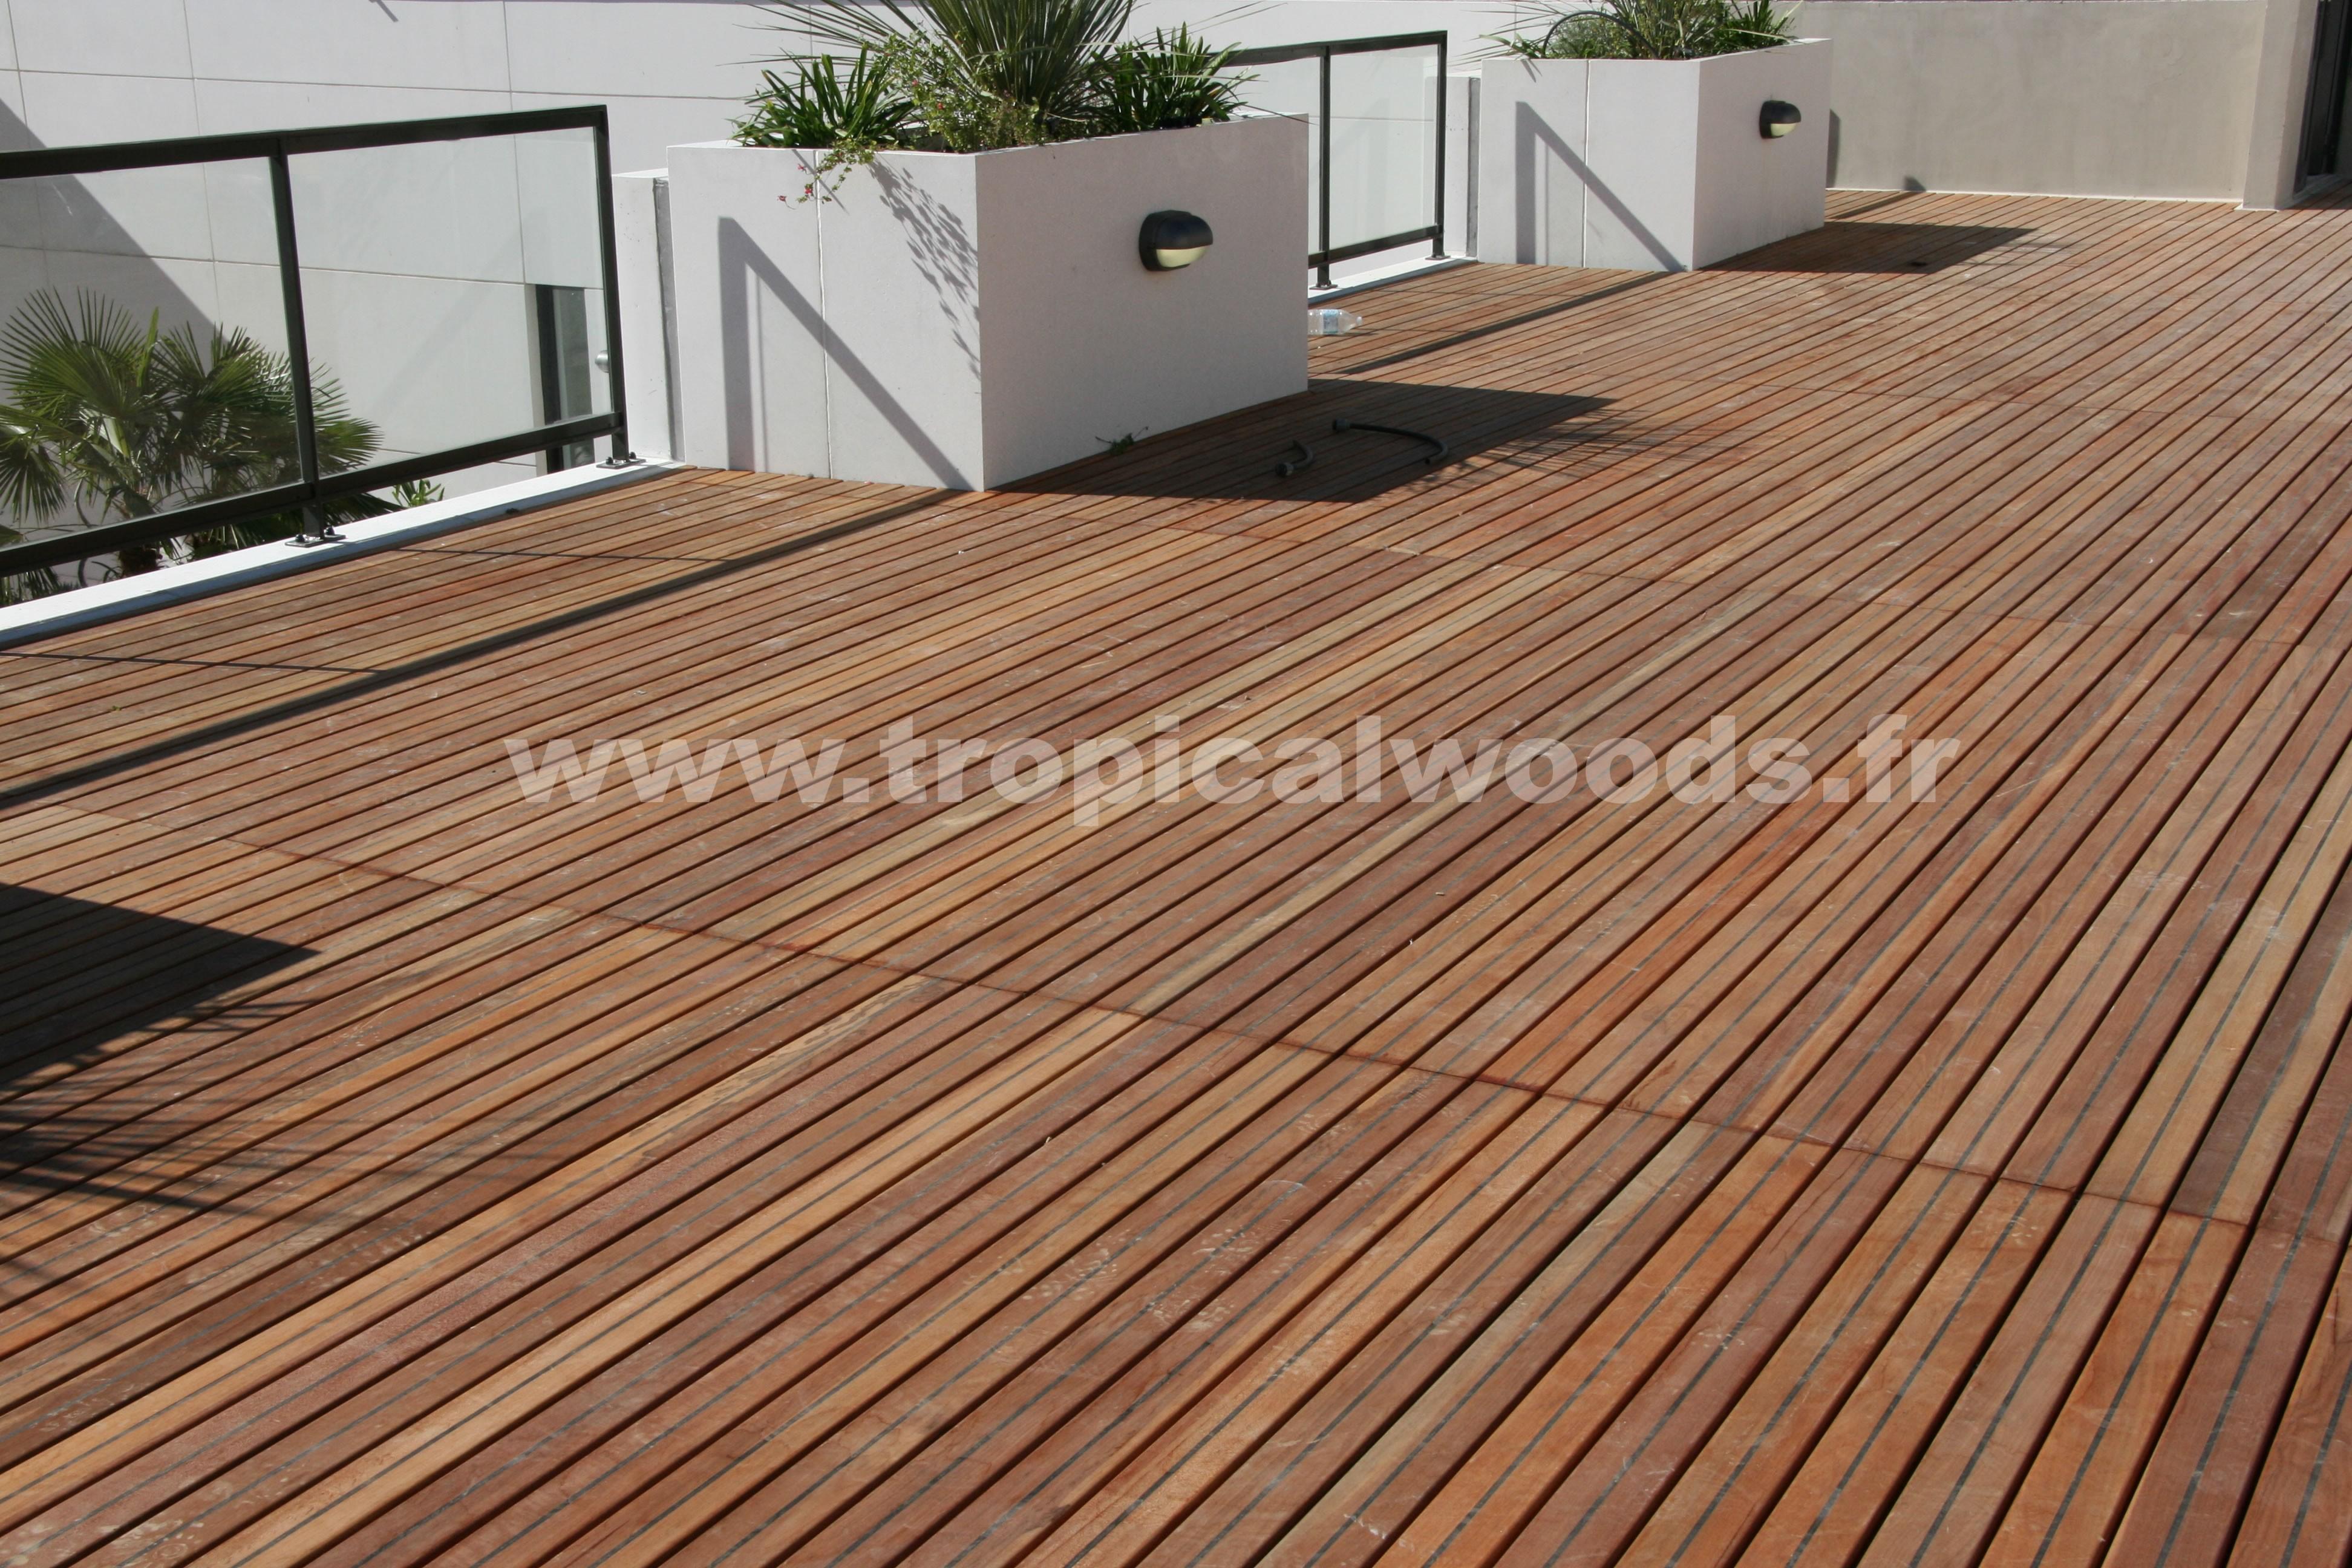 Terrasse - Lames parquet massif Red Cedar Pont de Bateau - 22 x 120 mm